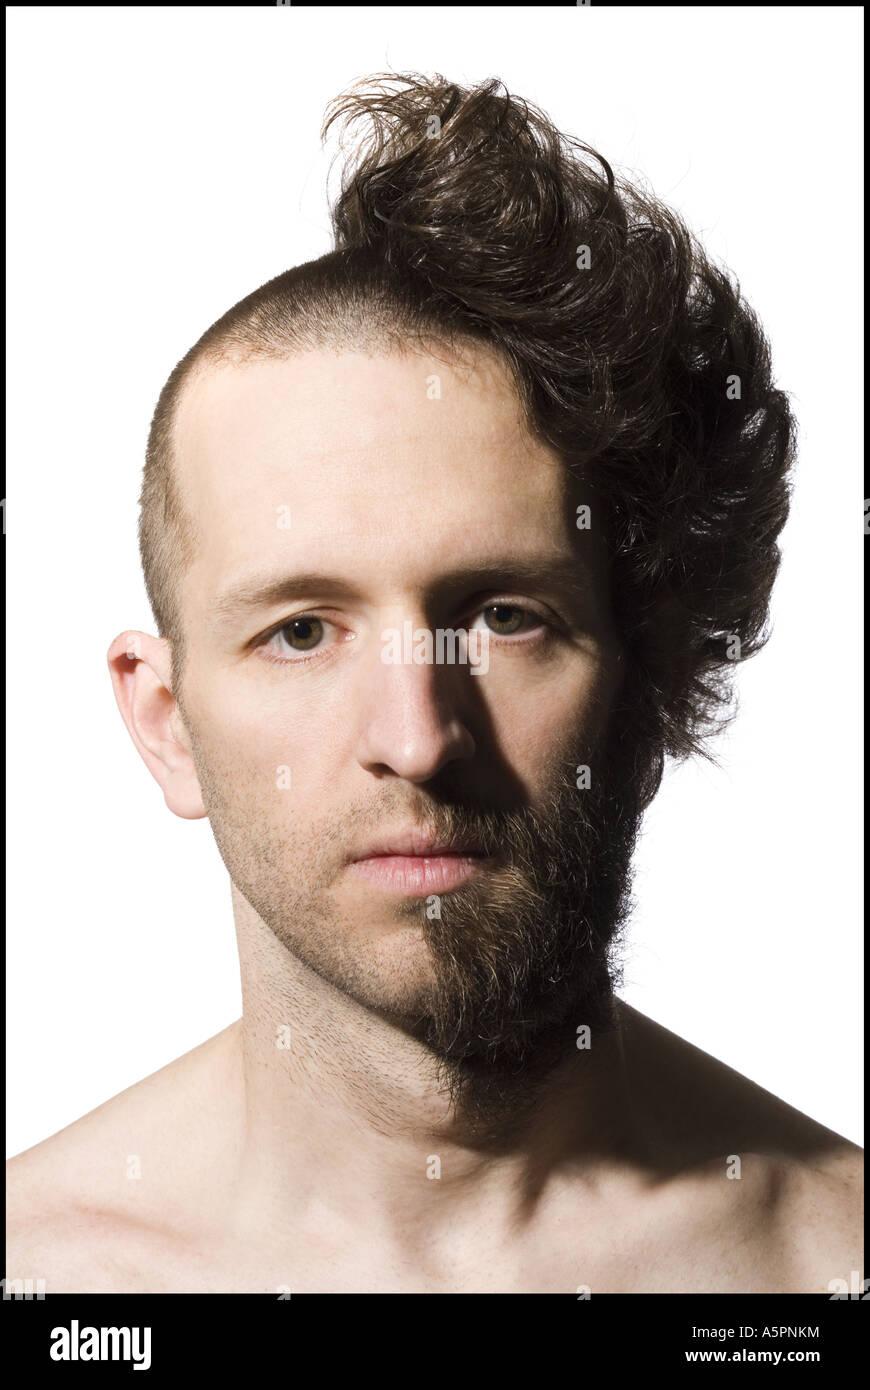 Man with half shaved head and beard Stock Photo - Alamy